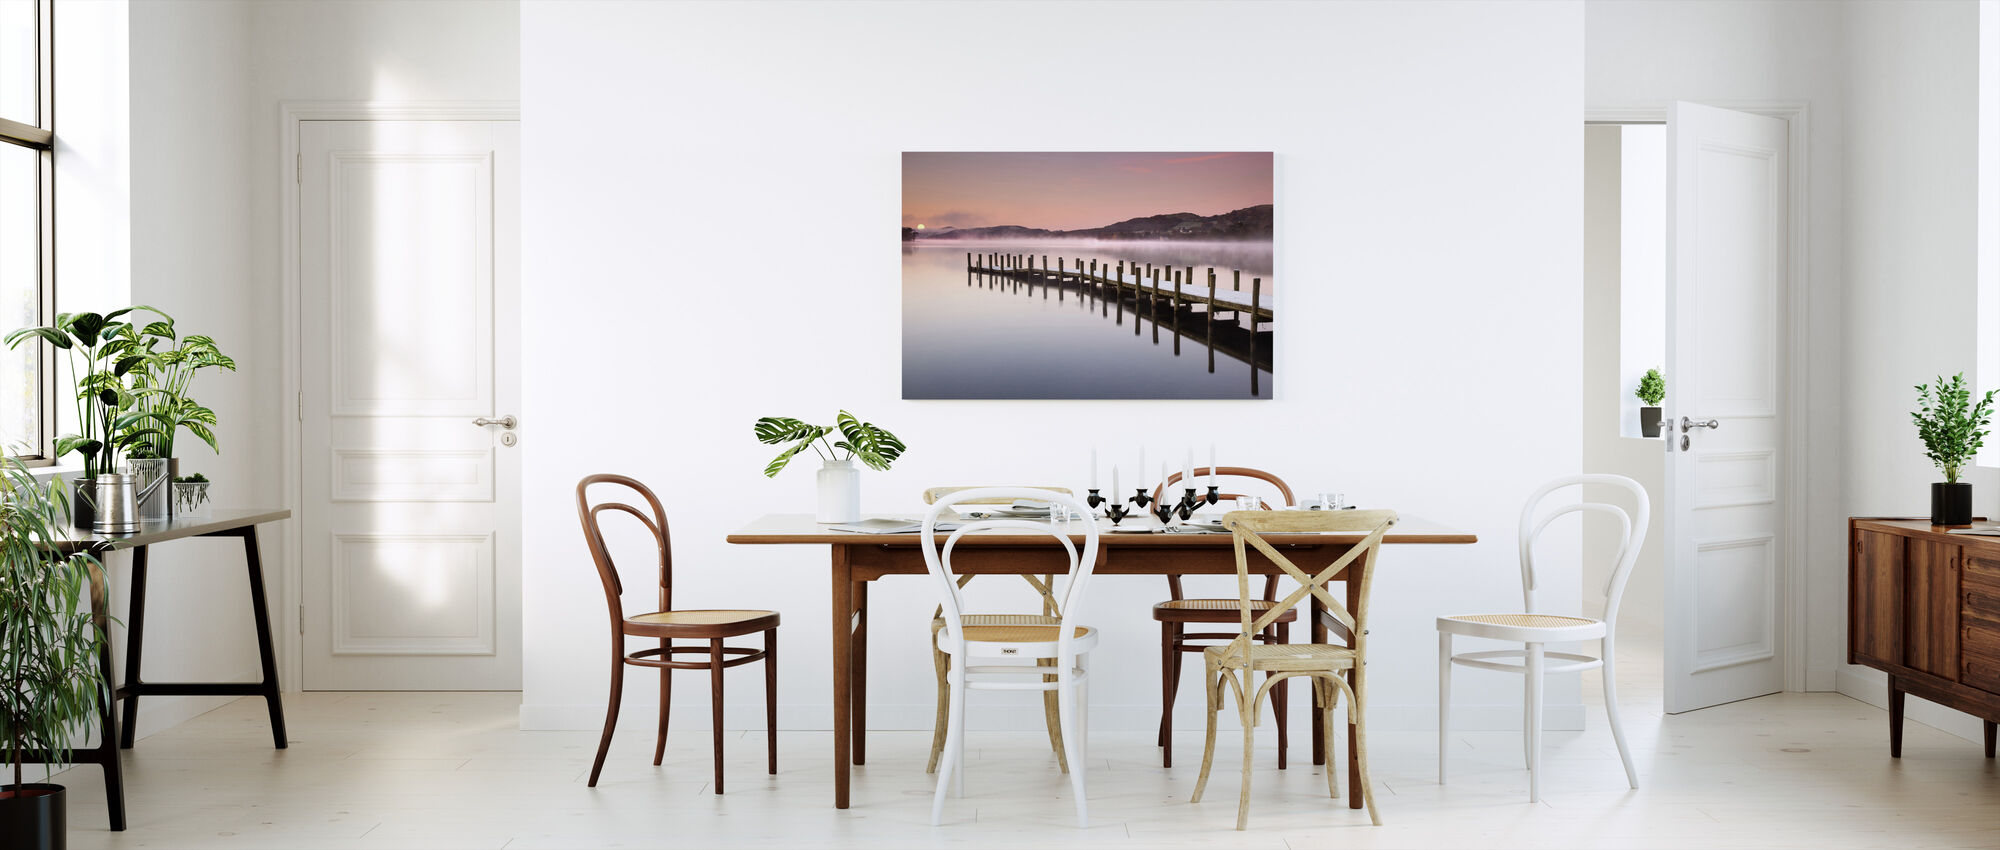 Landing Jetty on Coniston Water - Canvas print - Kitchen